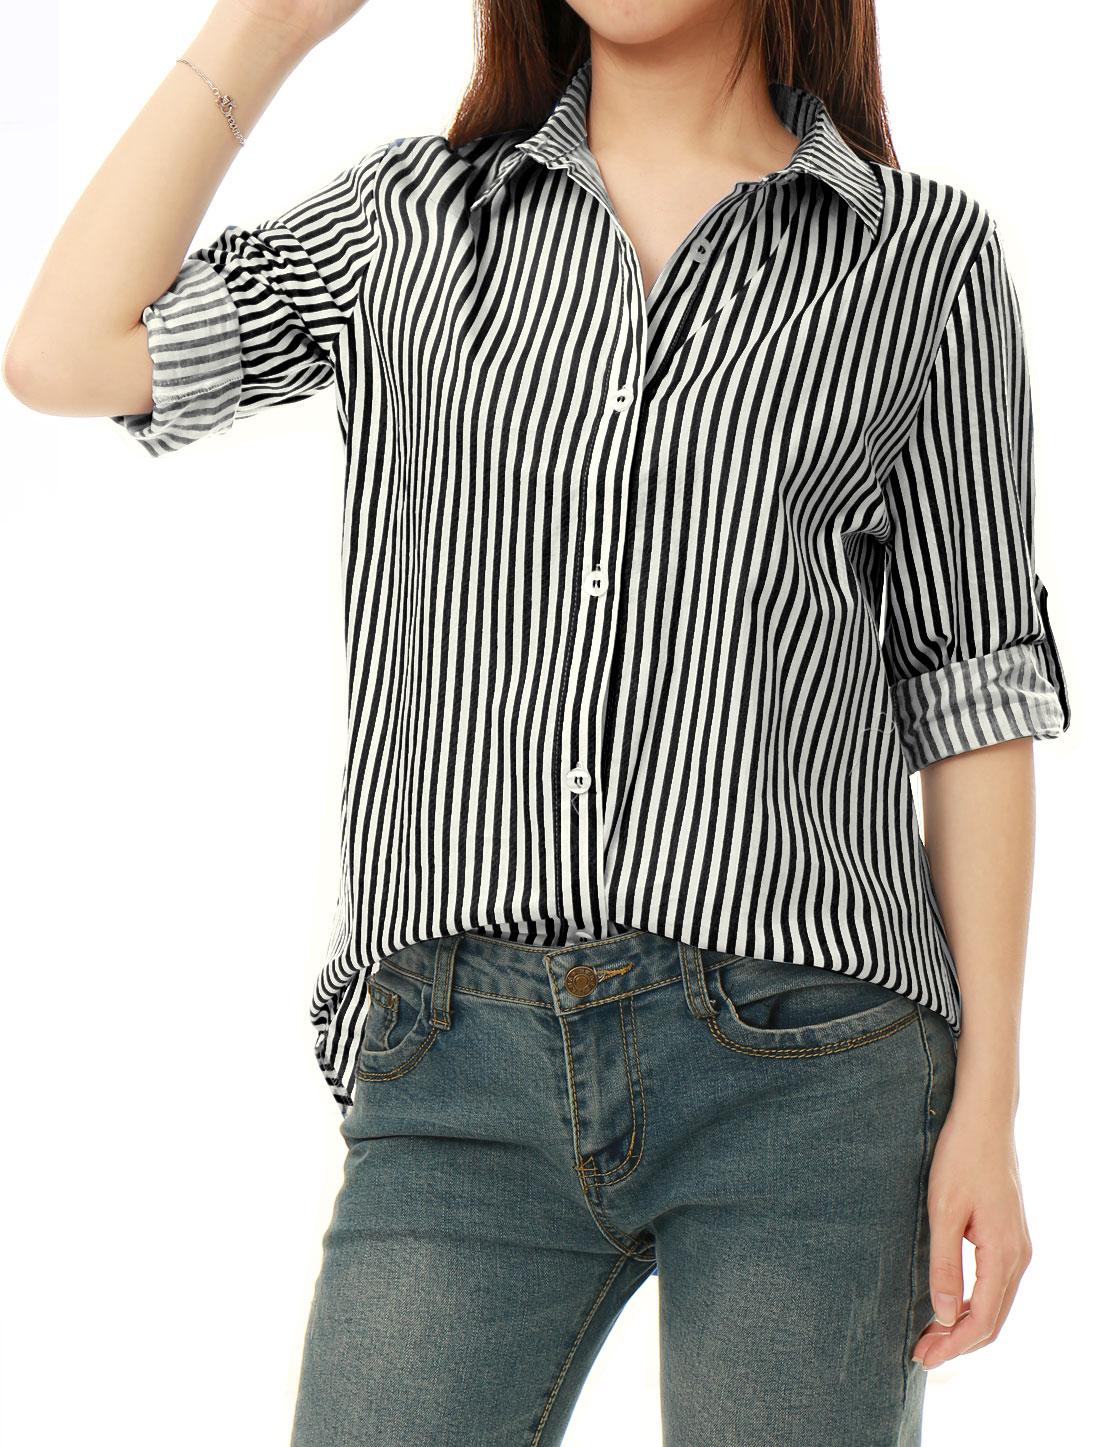 Allegra K Women Striped High Low Hem Roll Up Sleeves Shirt Black White L